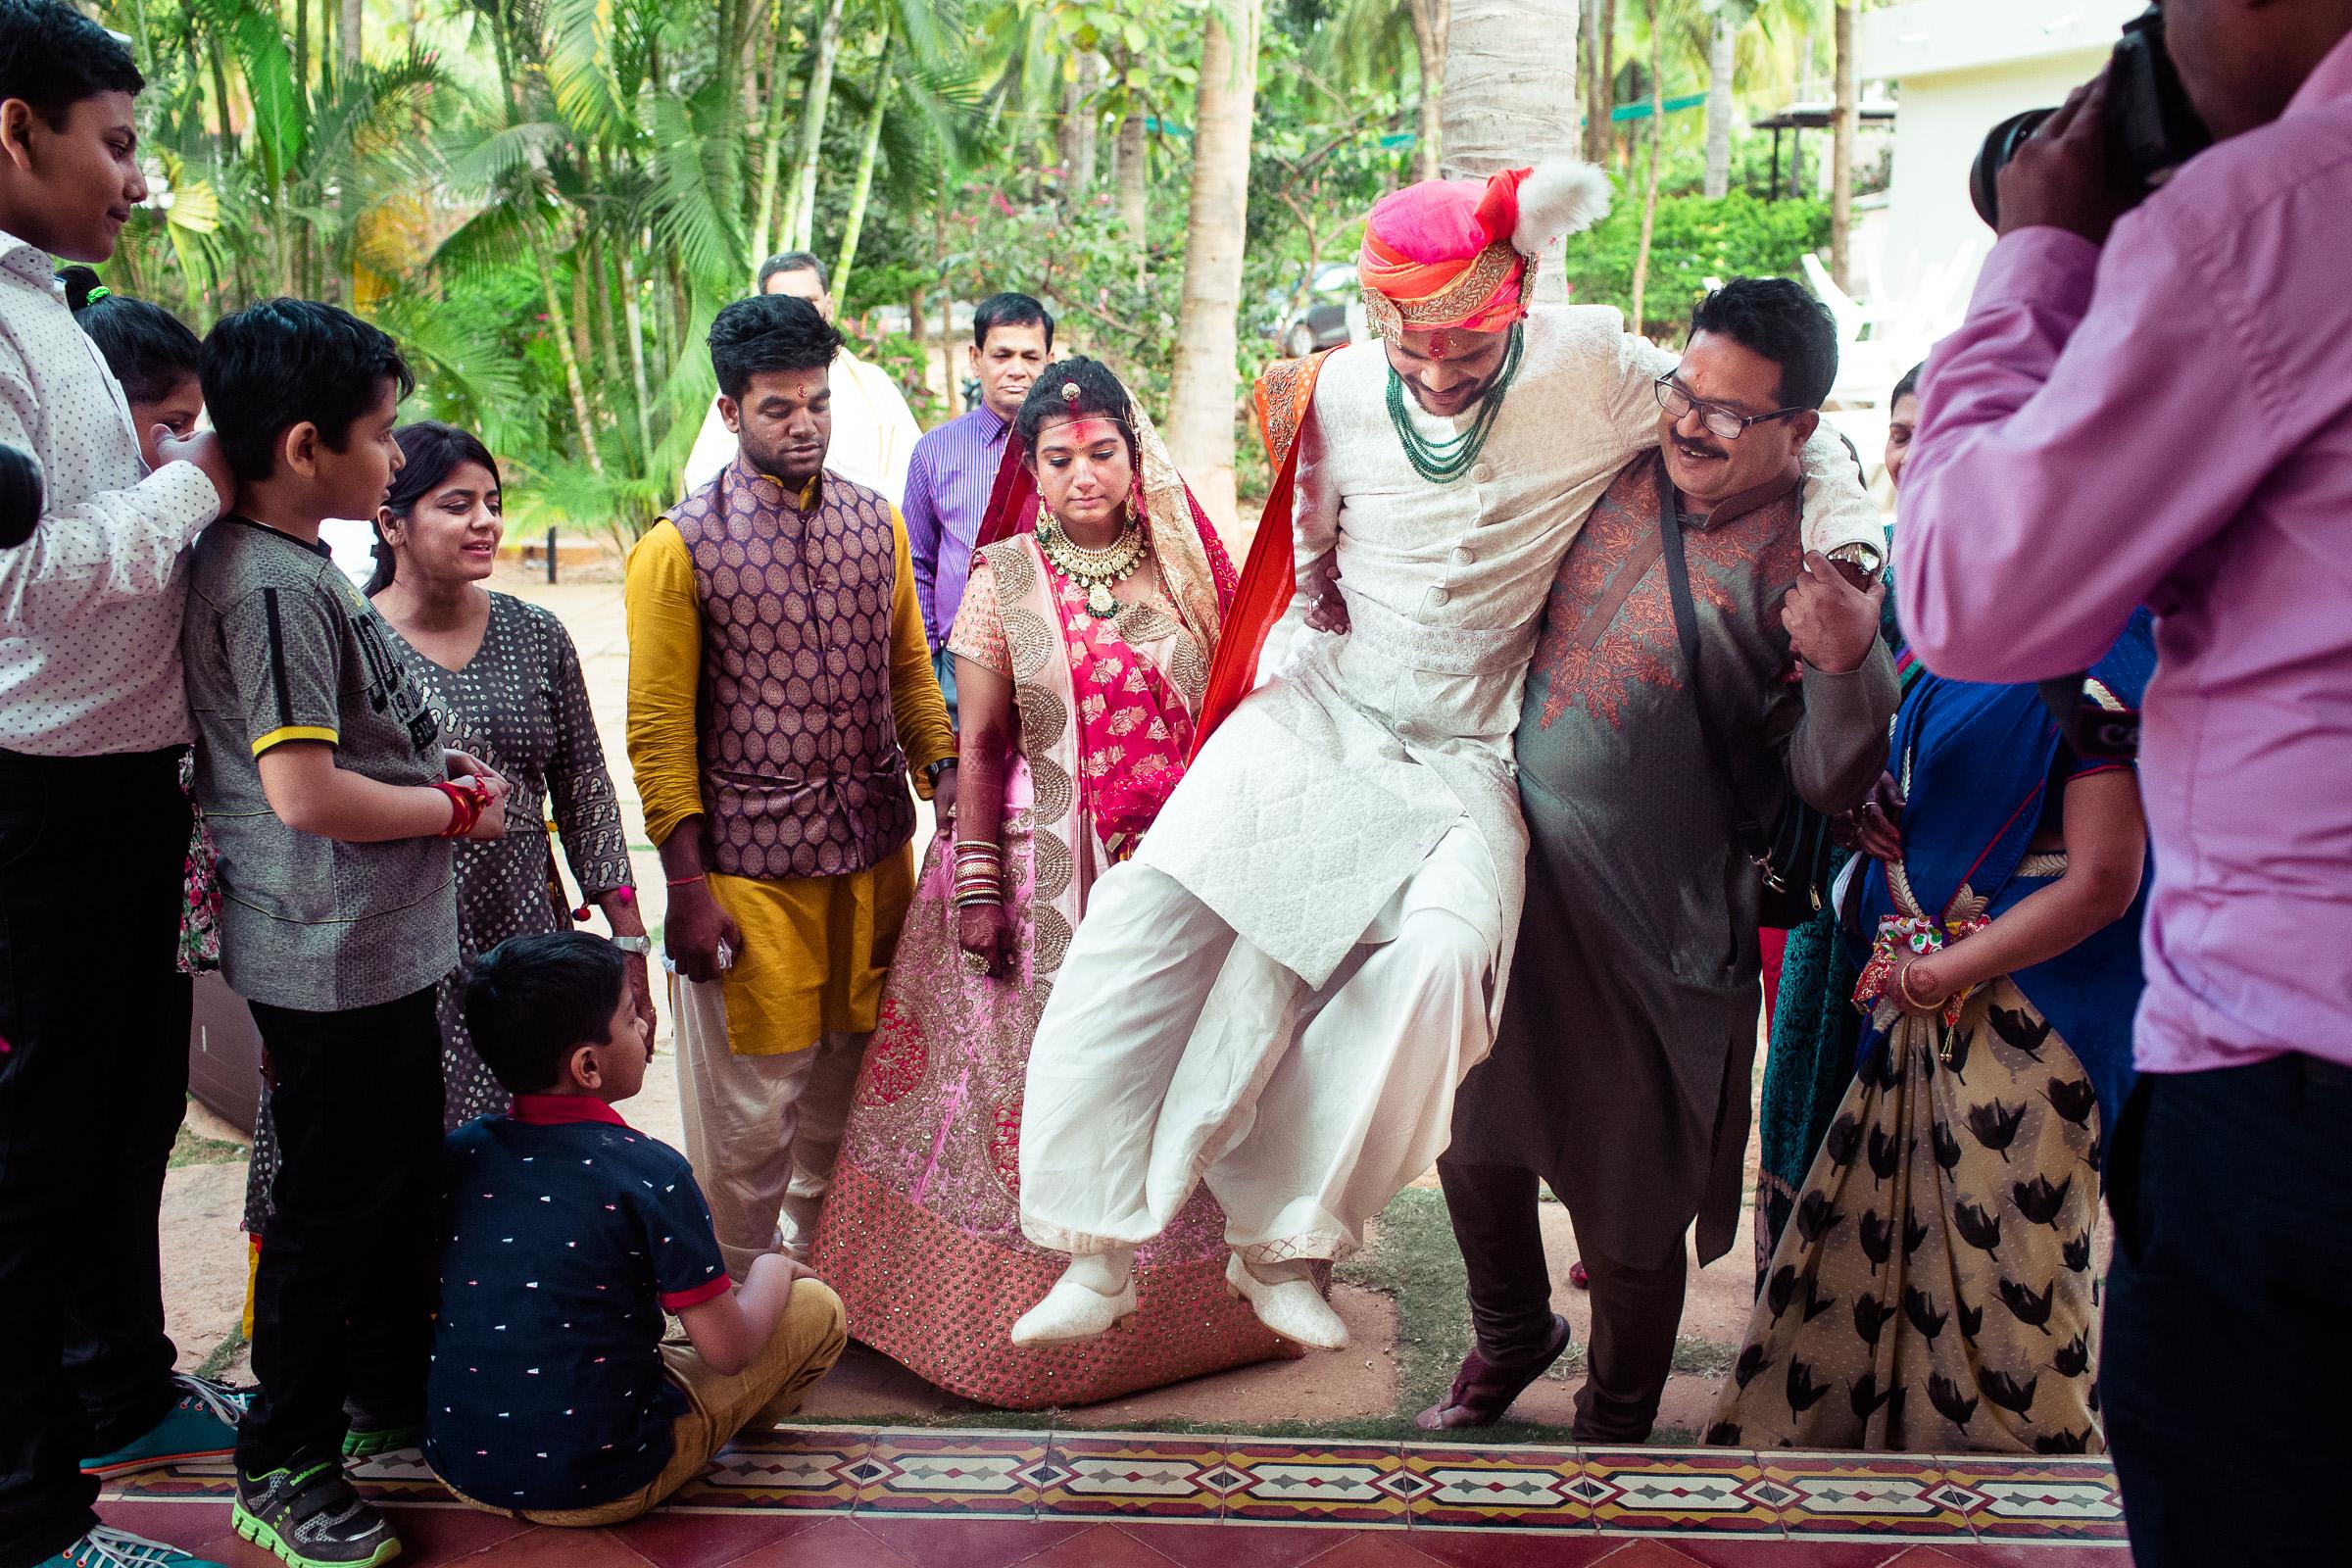 marwari-candid-wedding-photographers-bangalore-0057.jpg